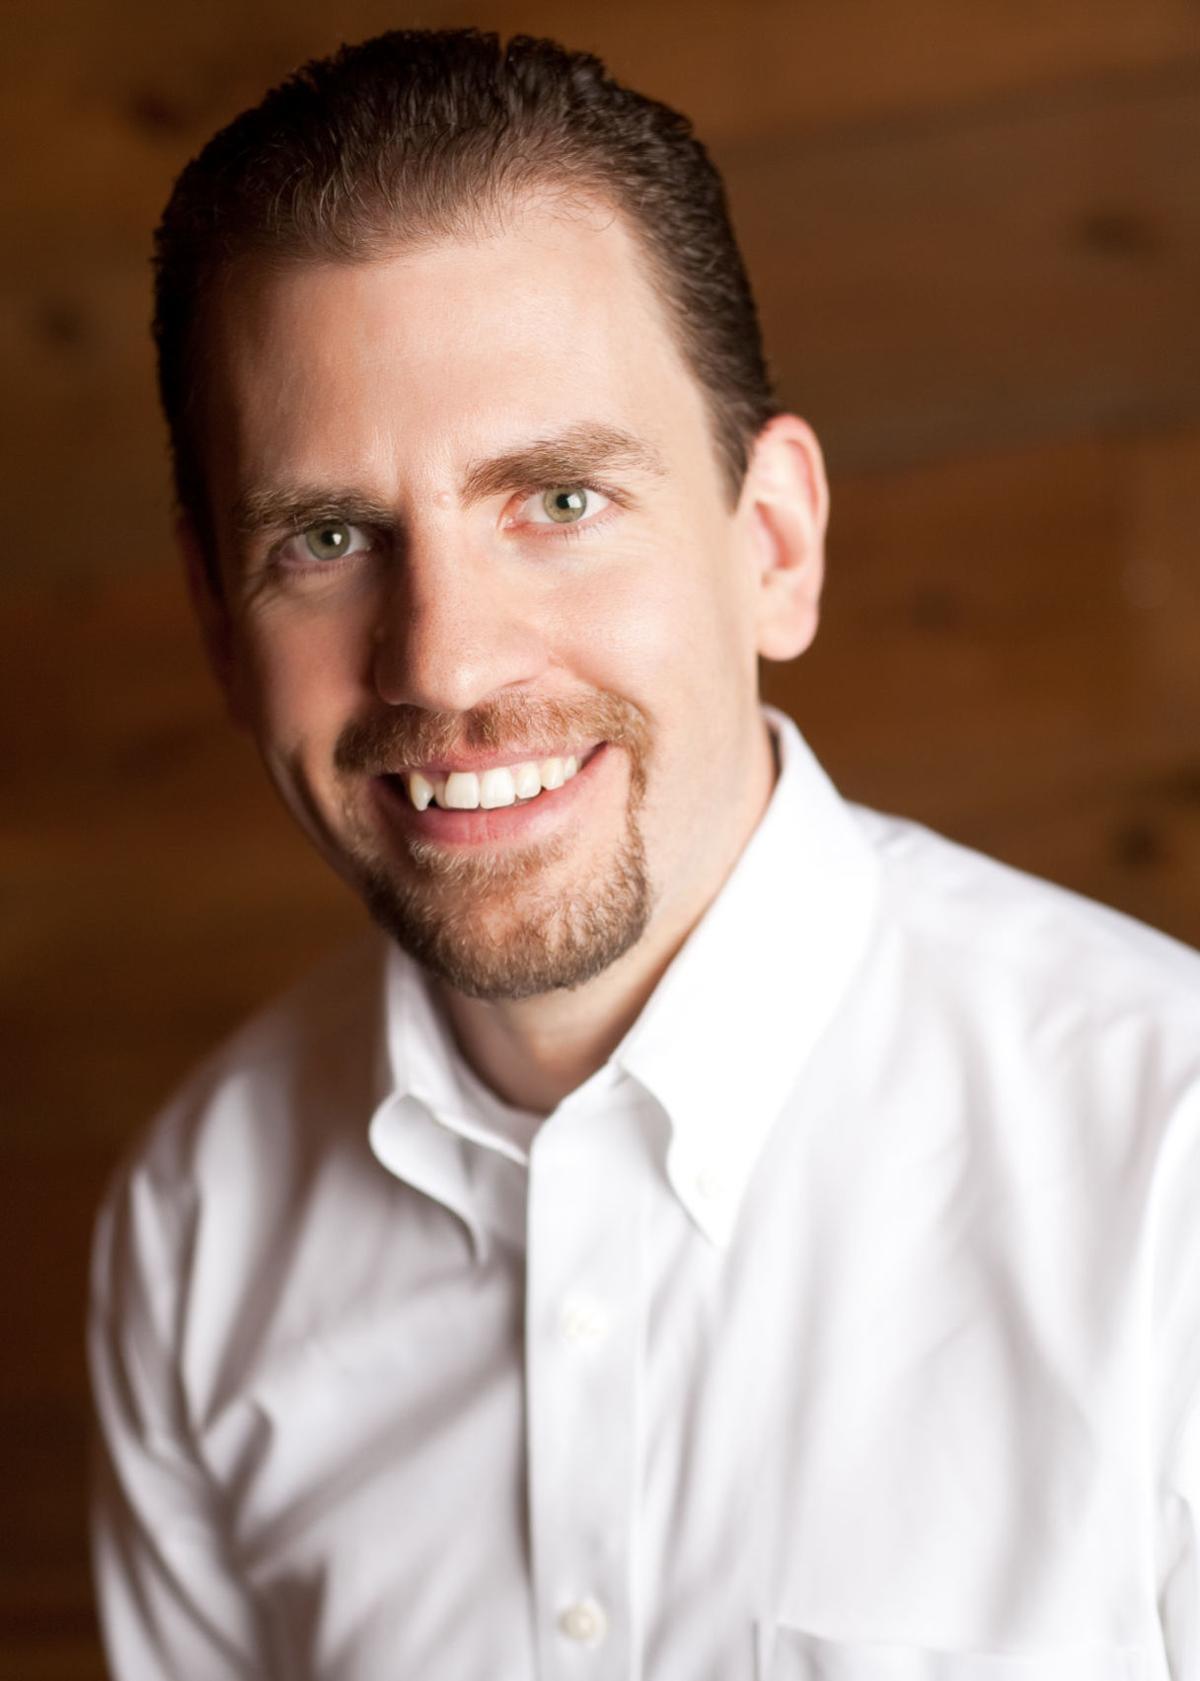 Vince Baugher